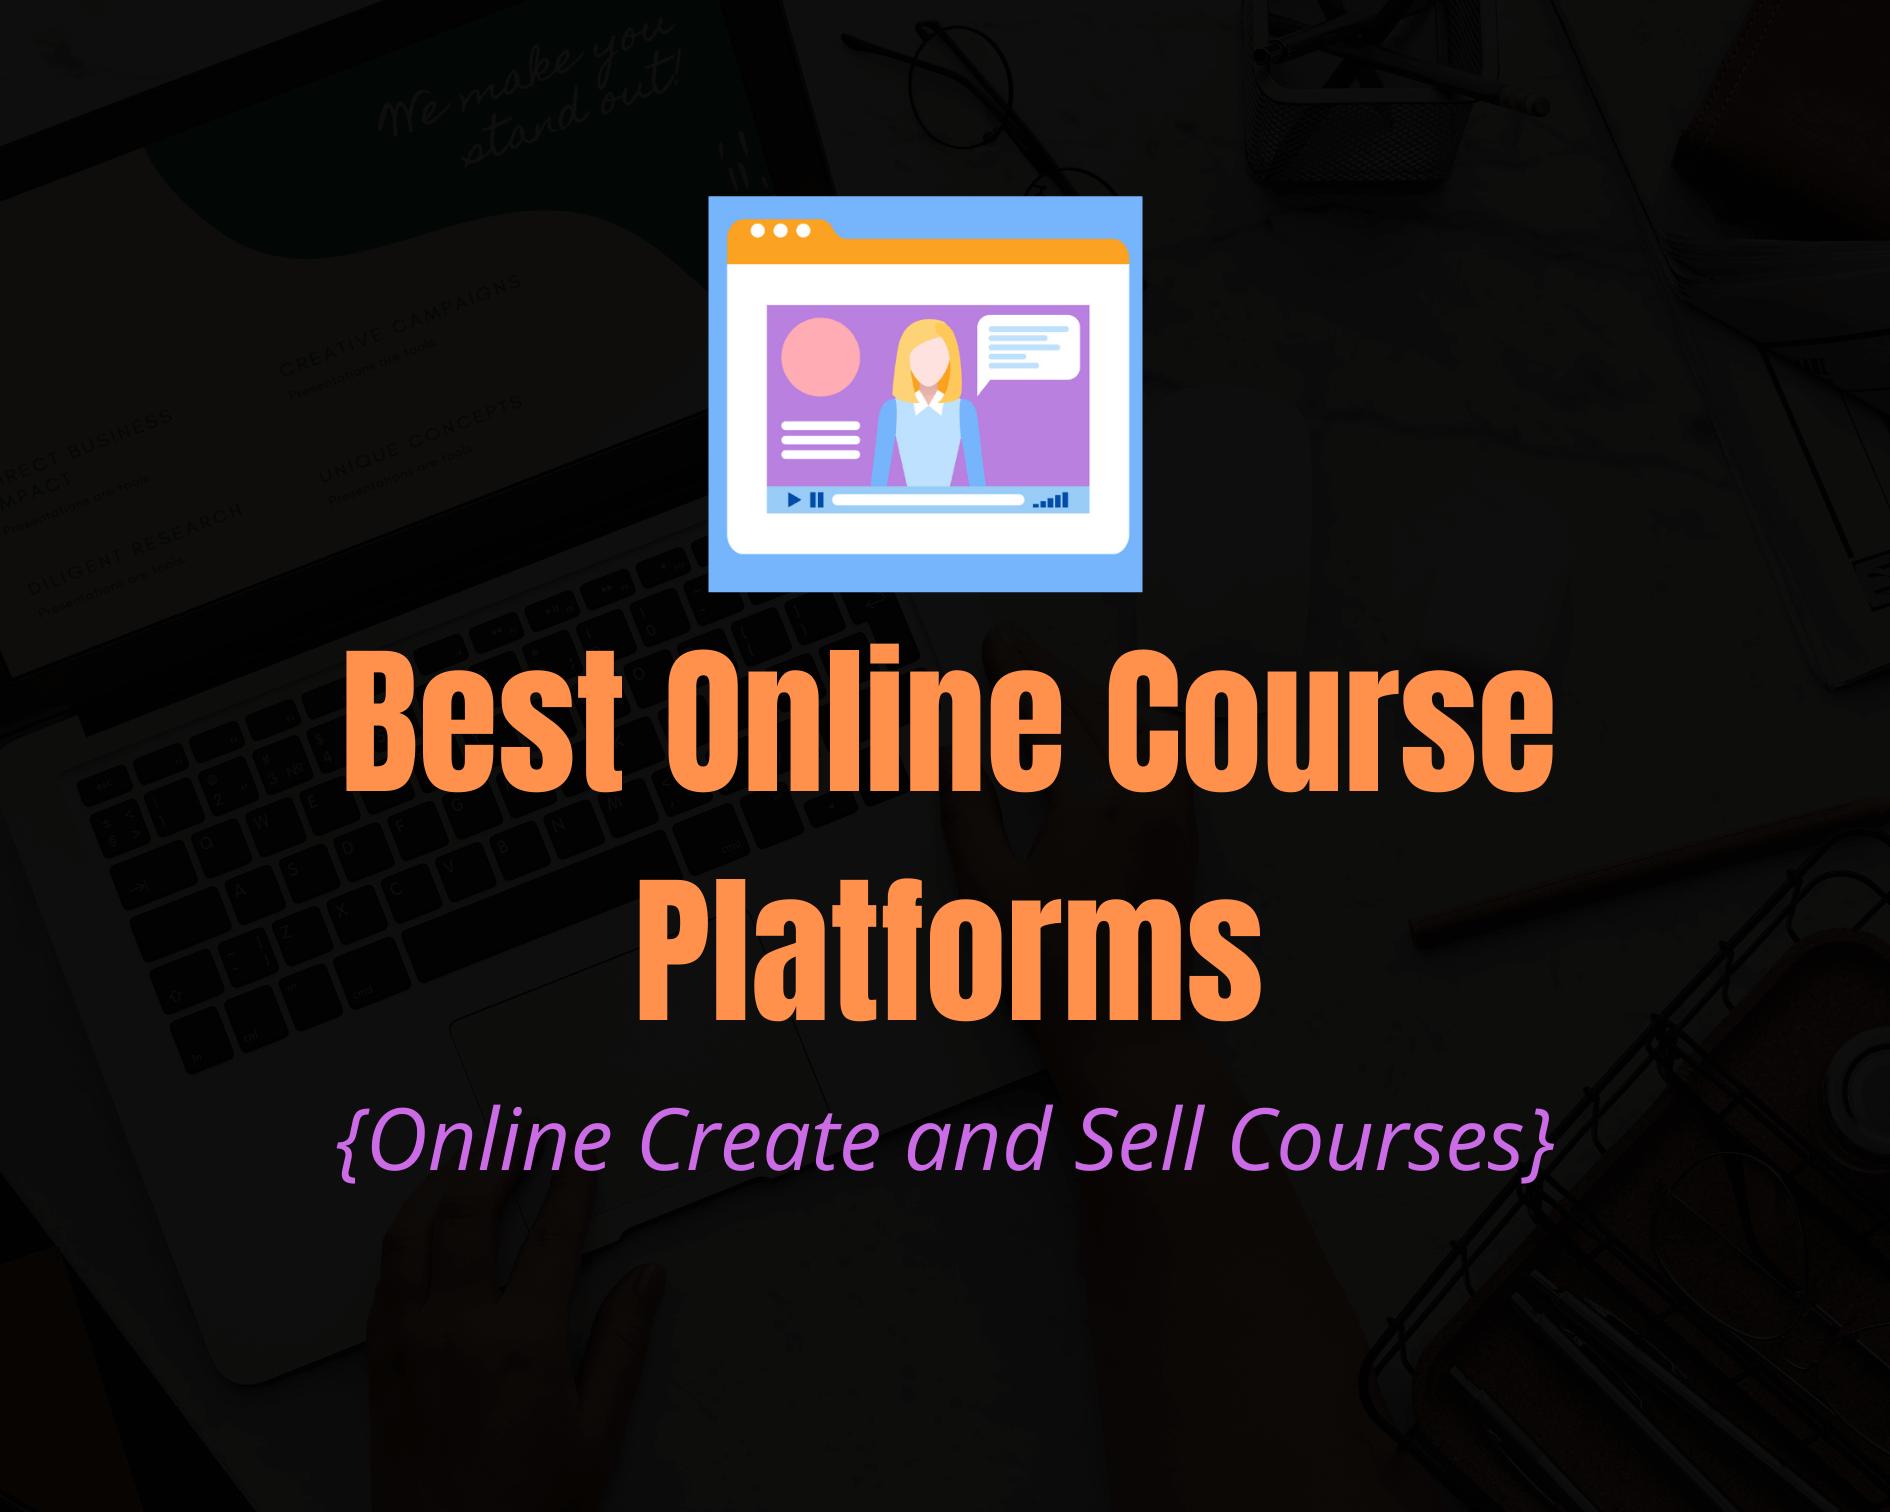 6 Best Online Course Platforms For 2020